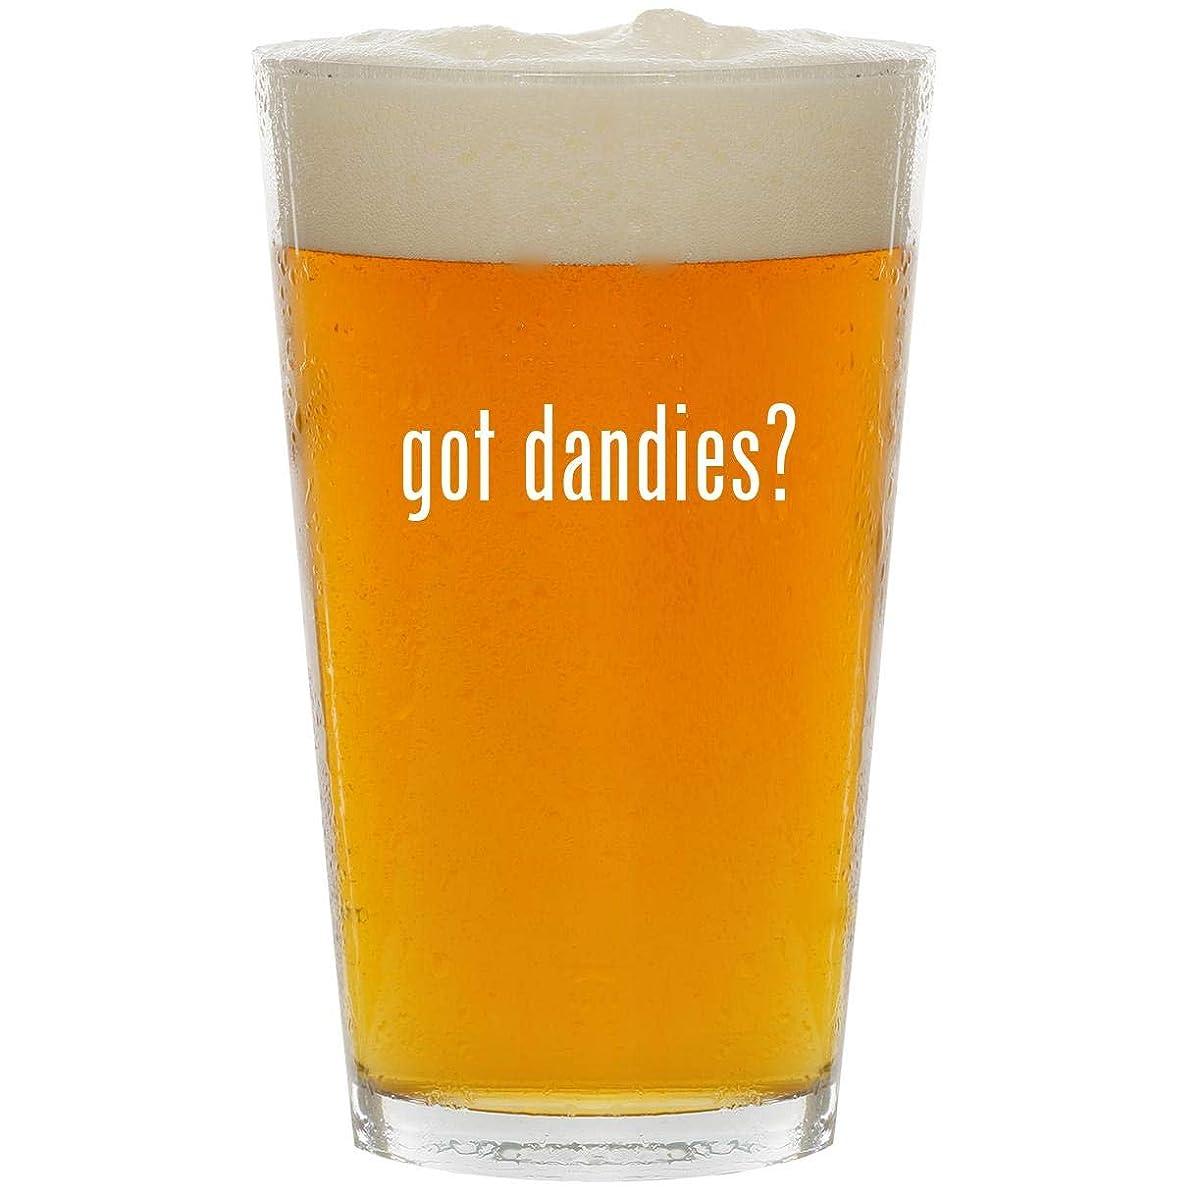 got dandies? - Glass 16oz Beer Pint